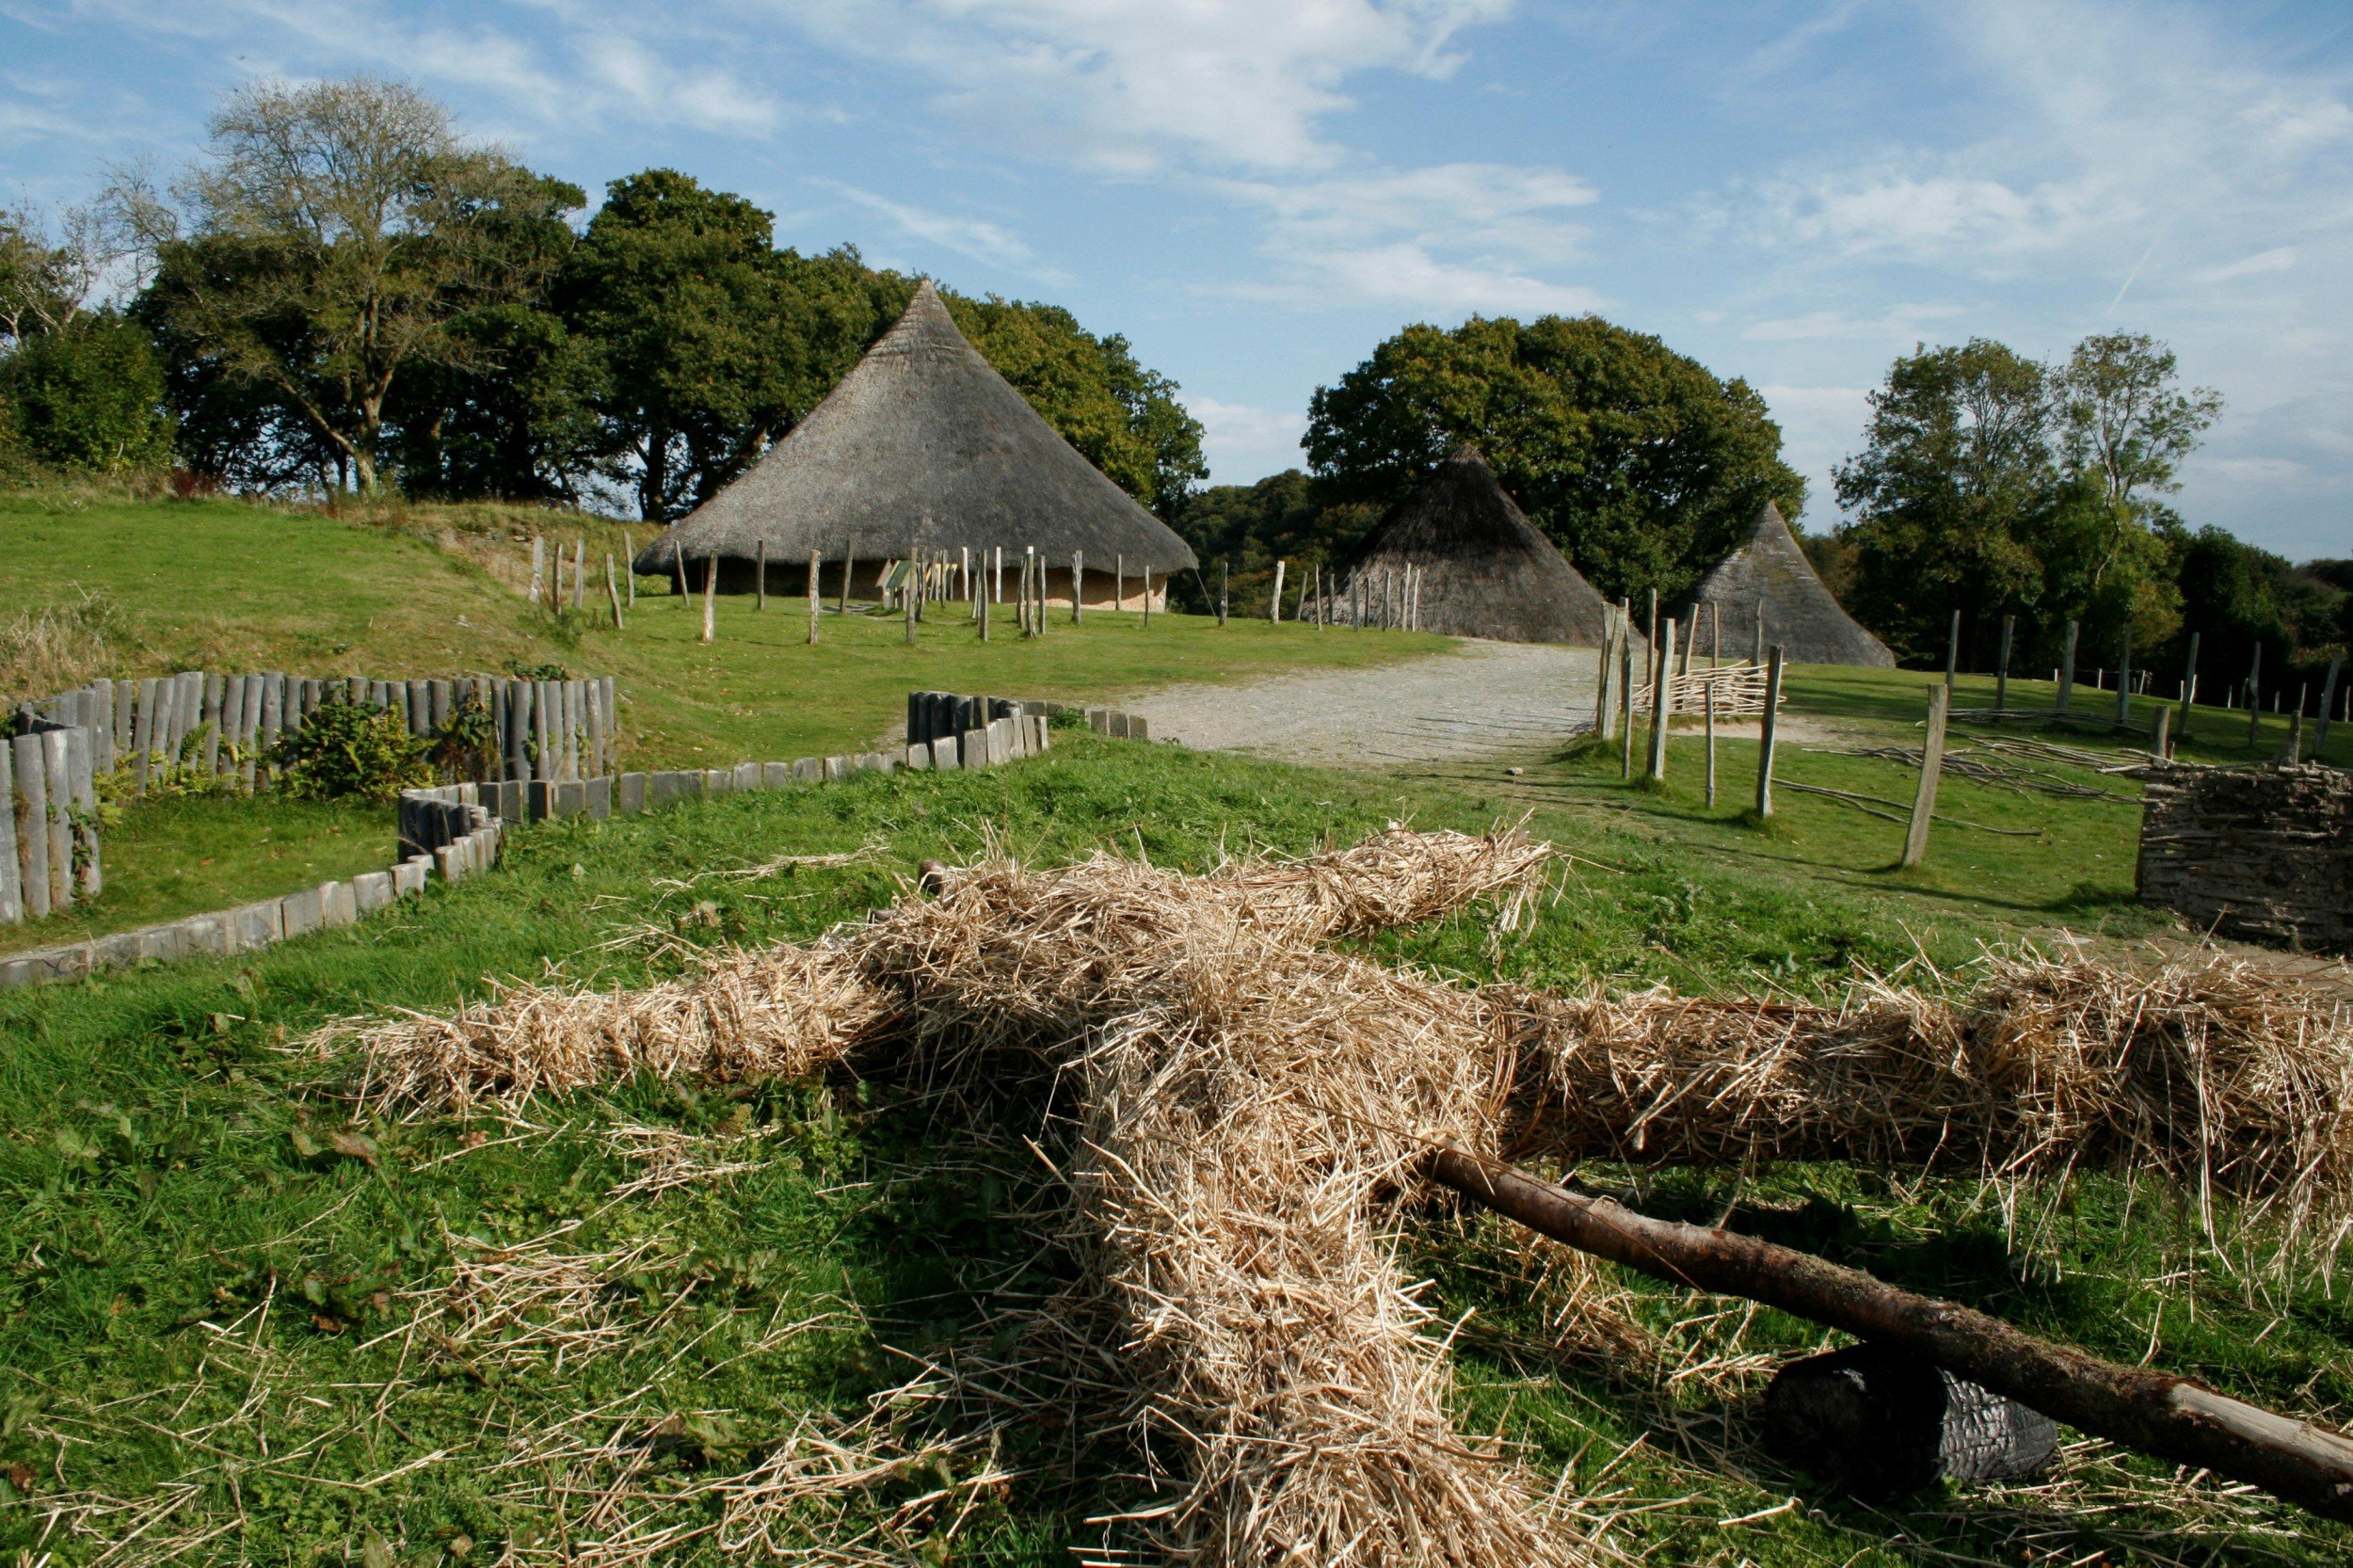 Castell Henllys Iron Age Village 6